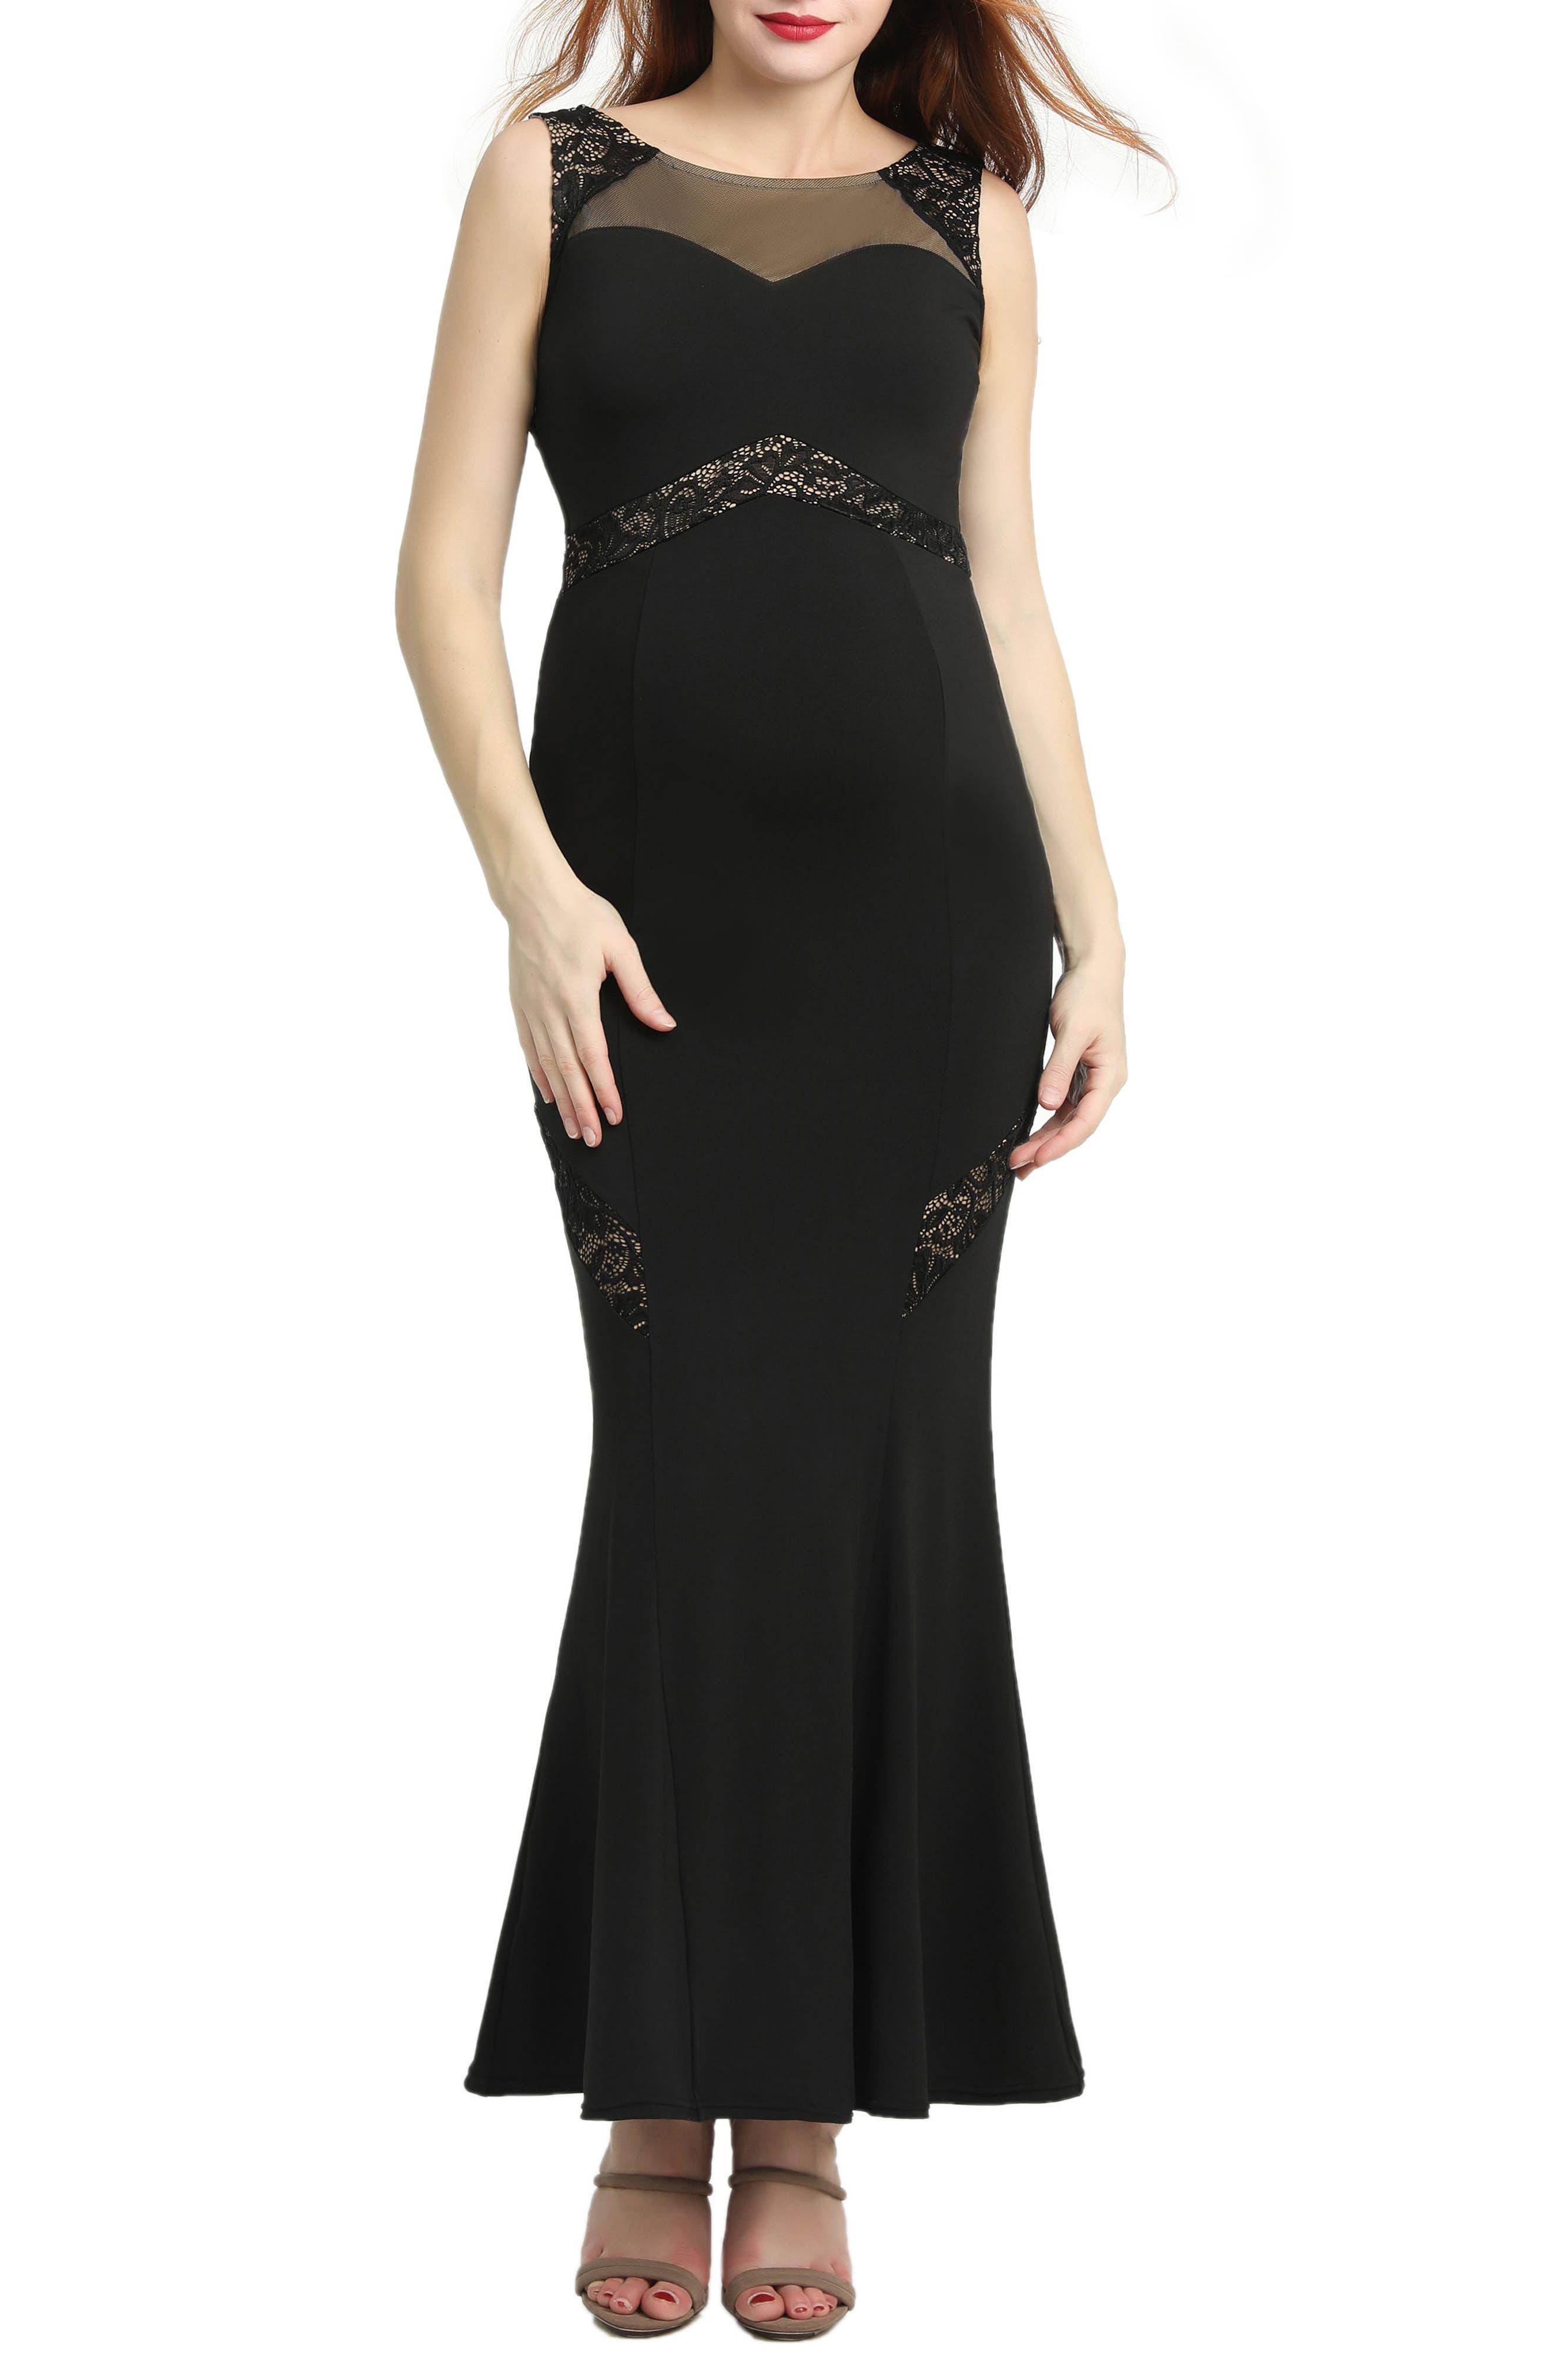 Kimi And Kai Corinne Lace Trim Maternity Mermaid Maxi Dress, Black